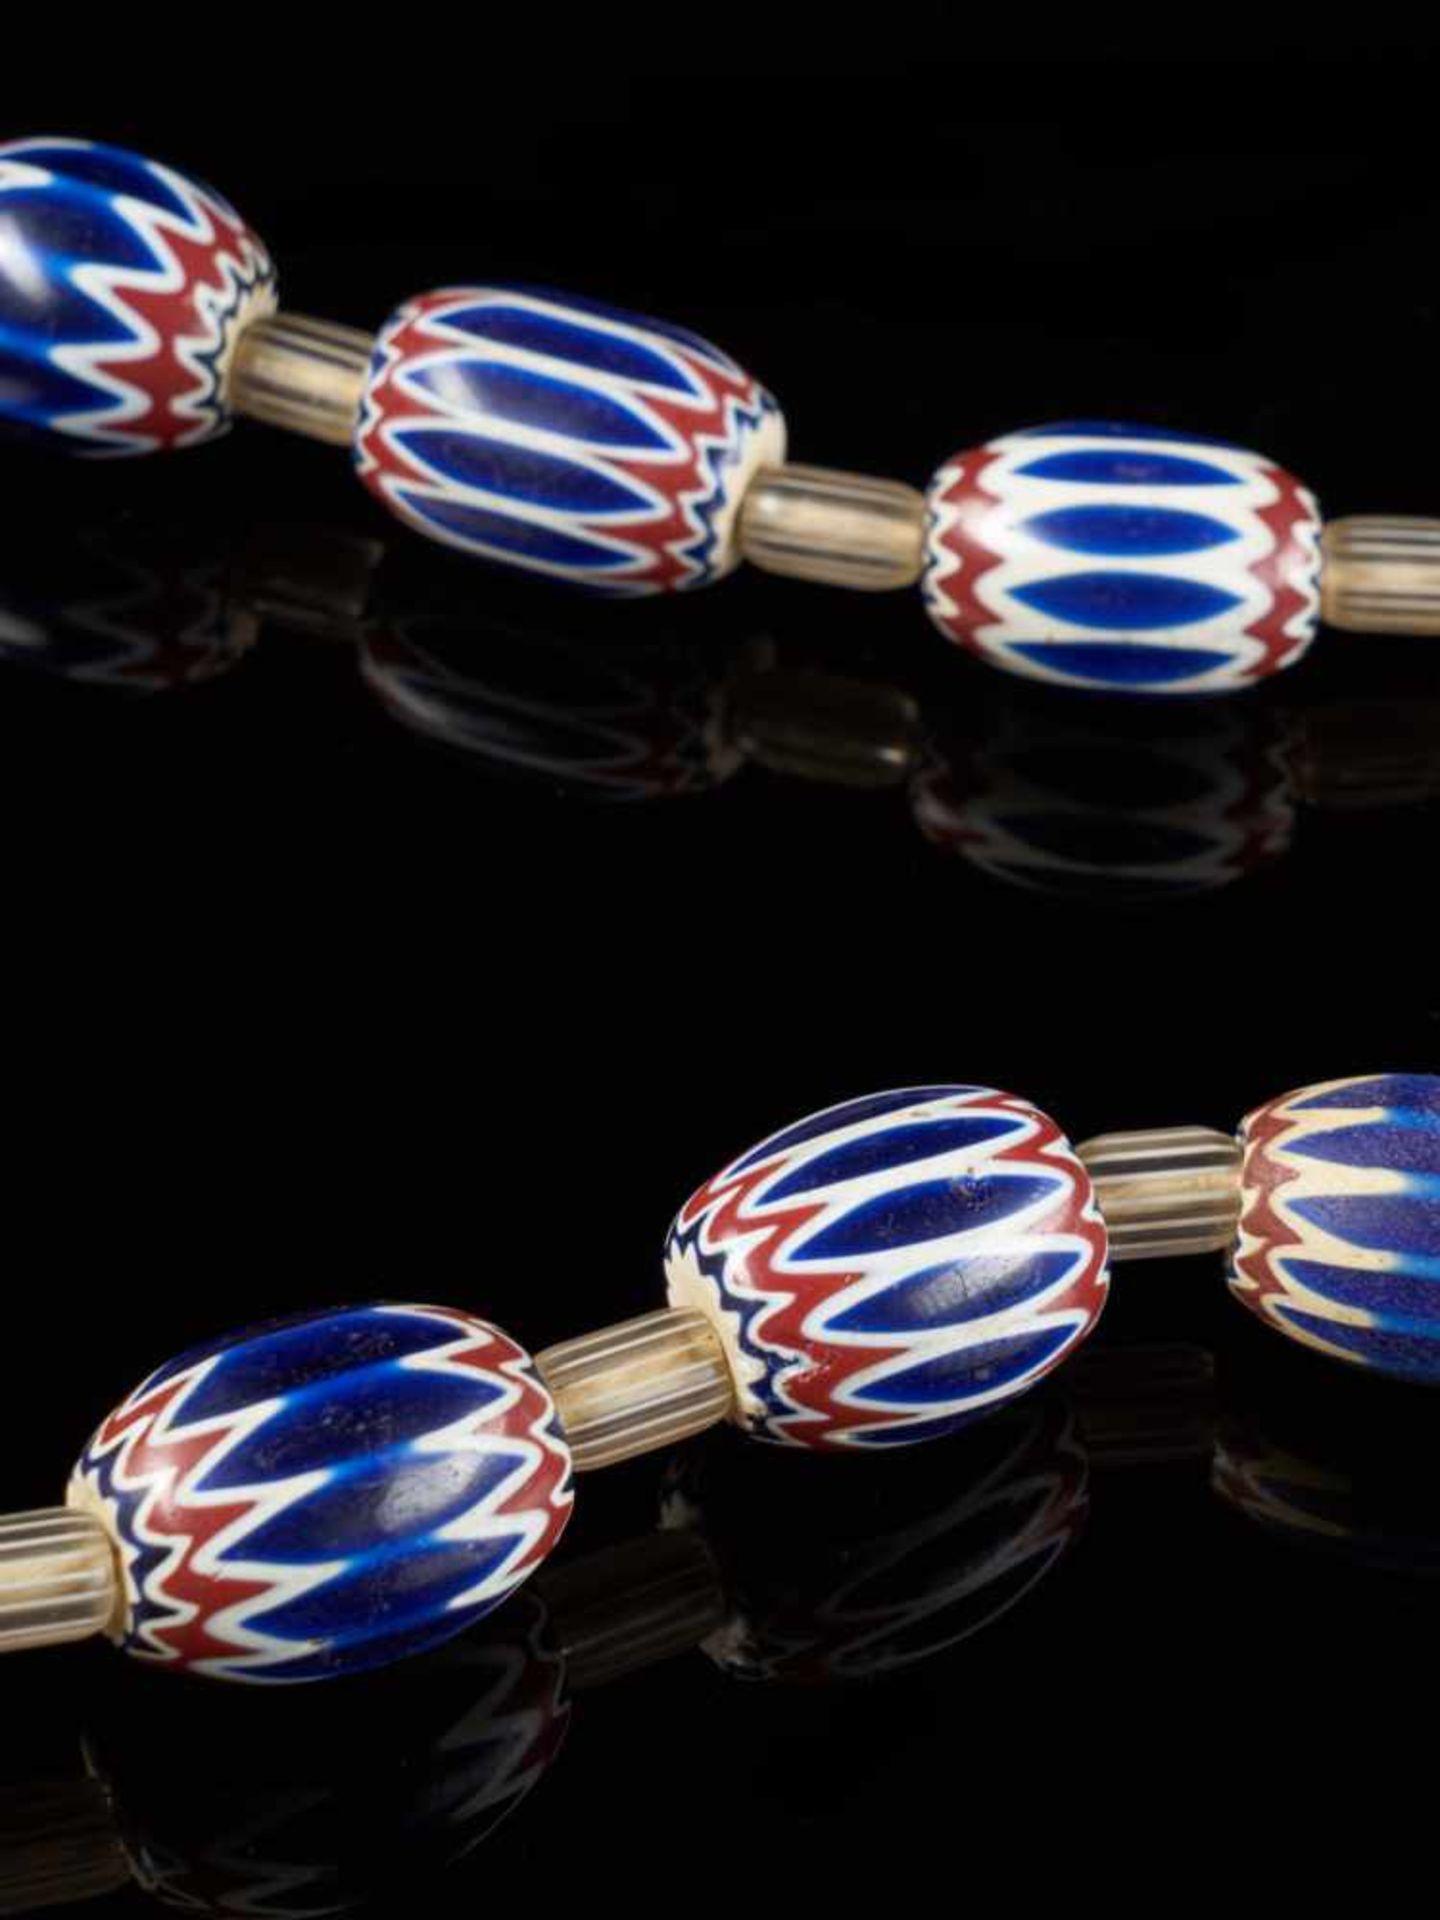 Traditional Bamileke 7 Layer Chevron Trade Bead Necklace Of 15 Beads. - Tribal ArtChevrons beads are - Bild 3 aus 5